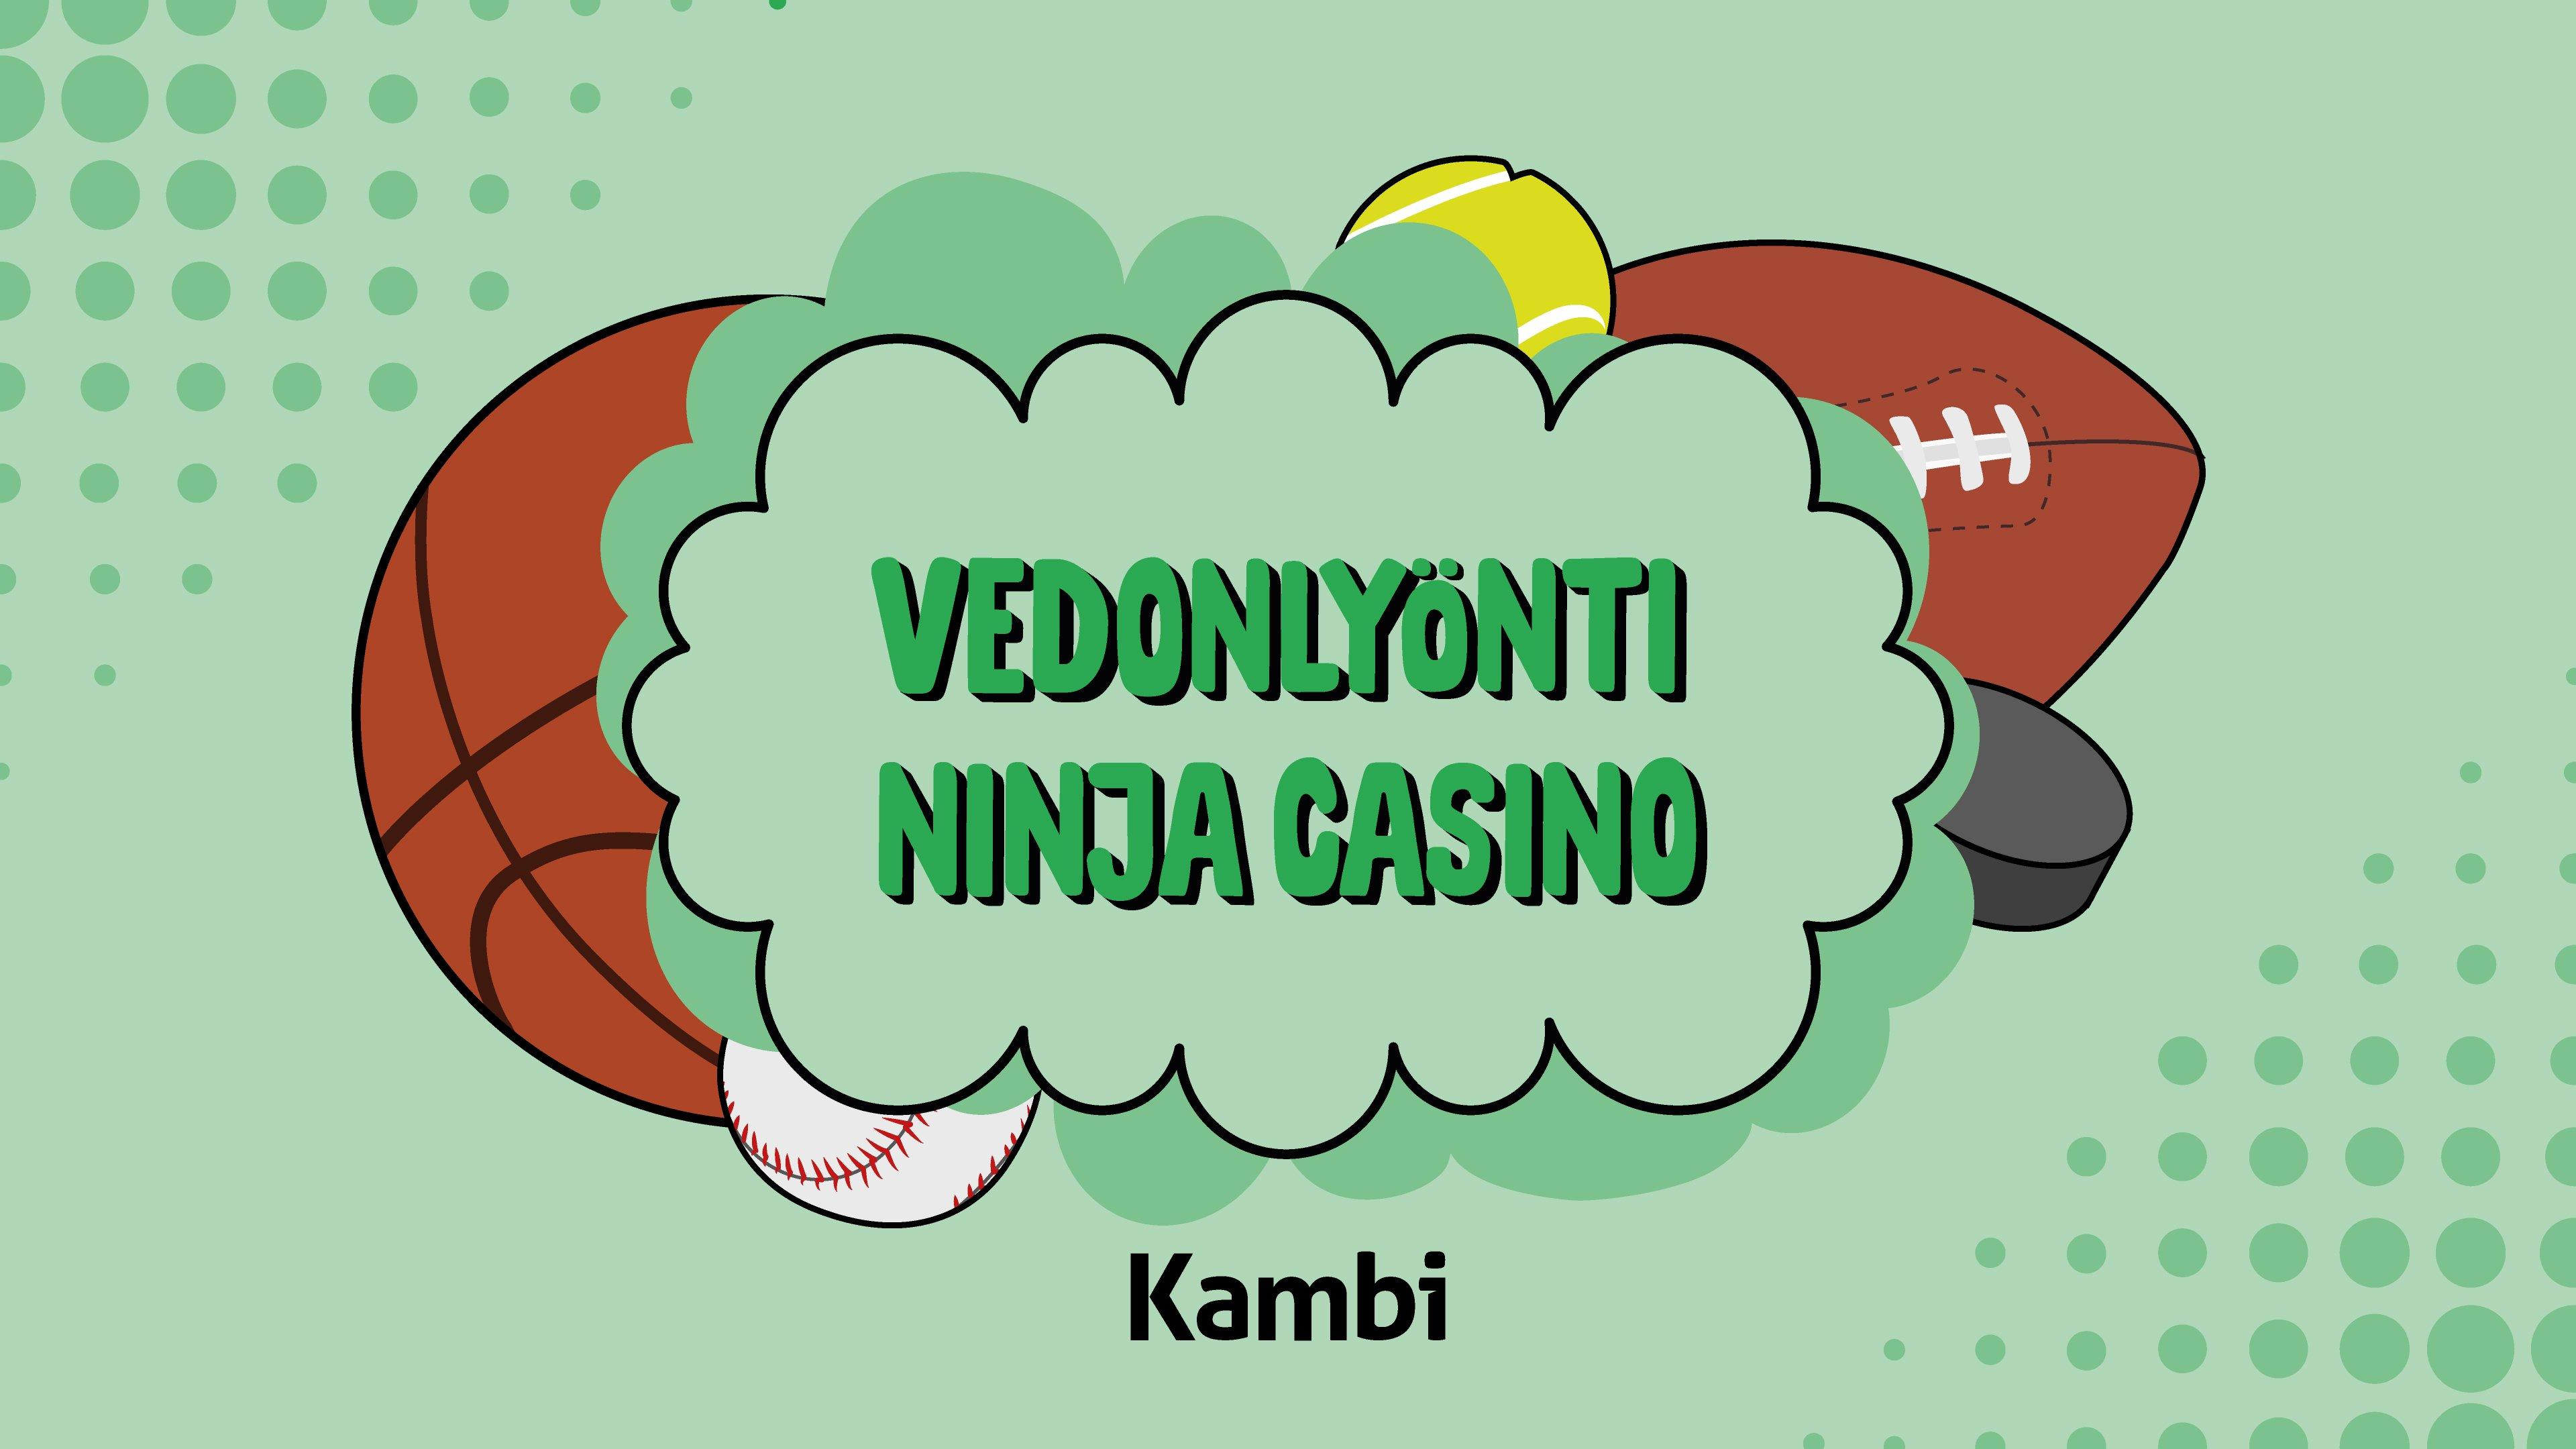 Ninja Casino vedonlyönti